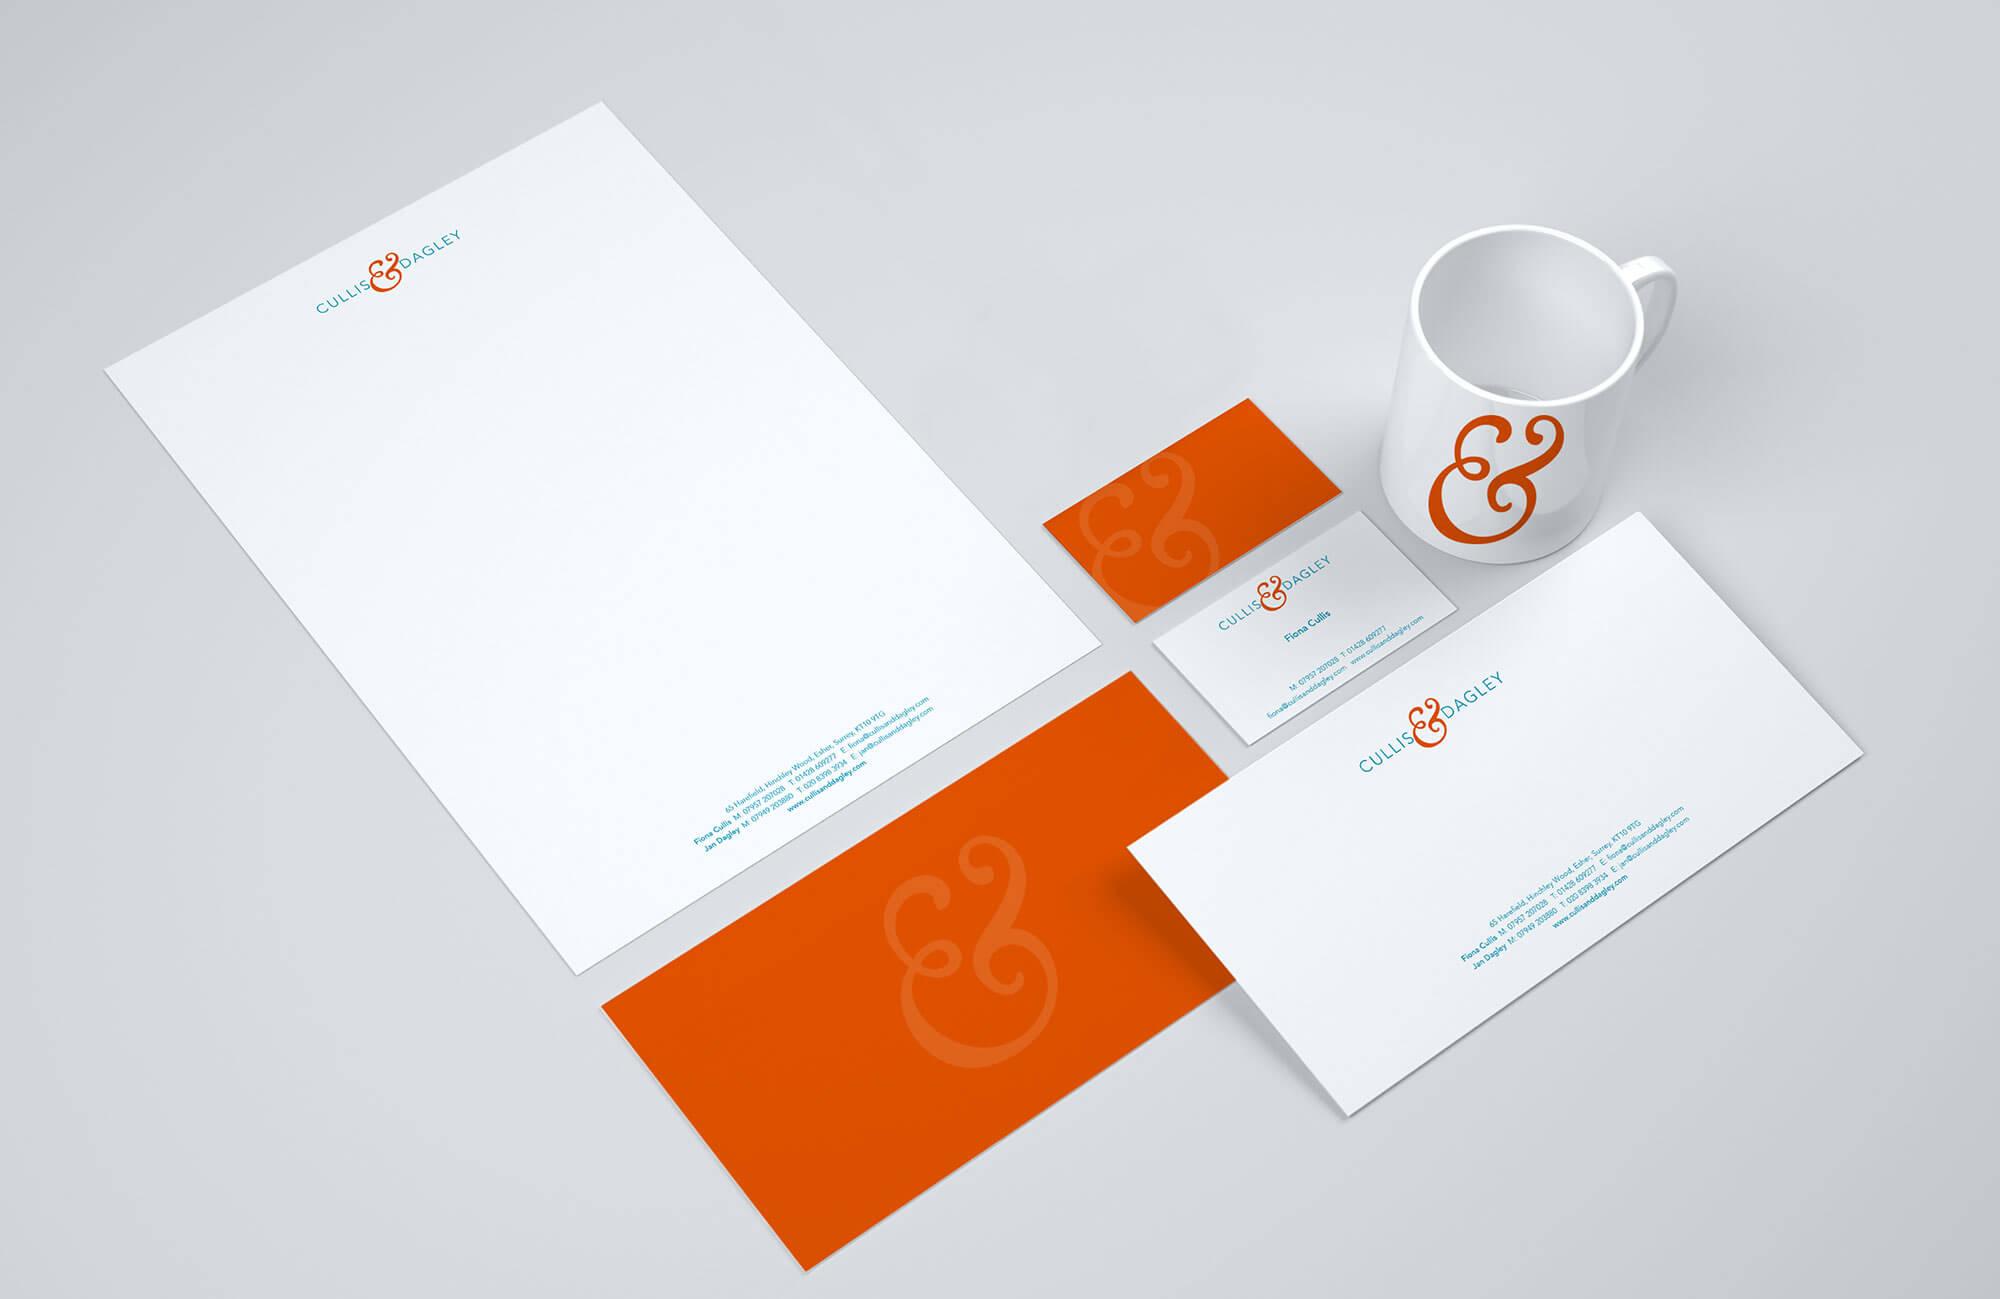 Cullis & Dagley Stationery Design Concept